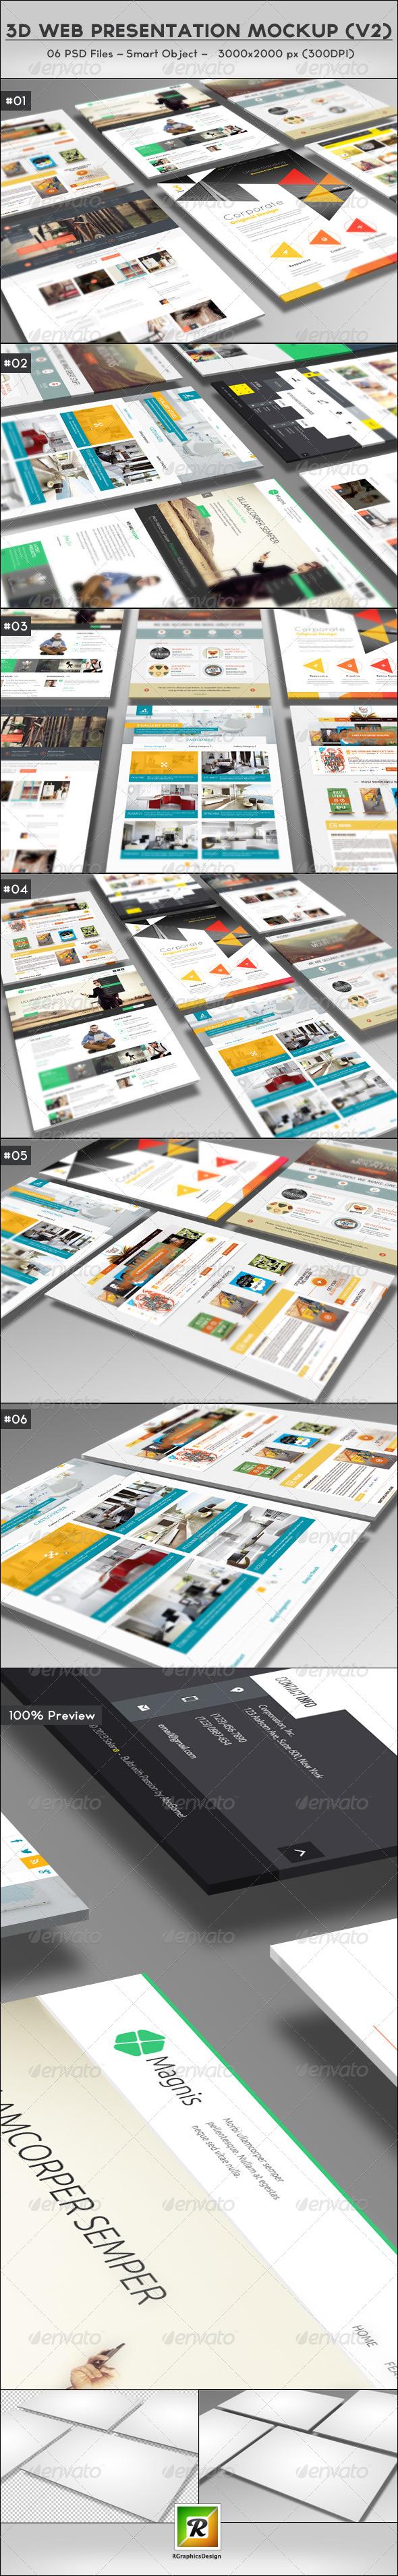 GraphicRiver 3D Web Presentation Mockup V2 5688000